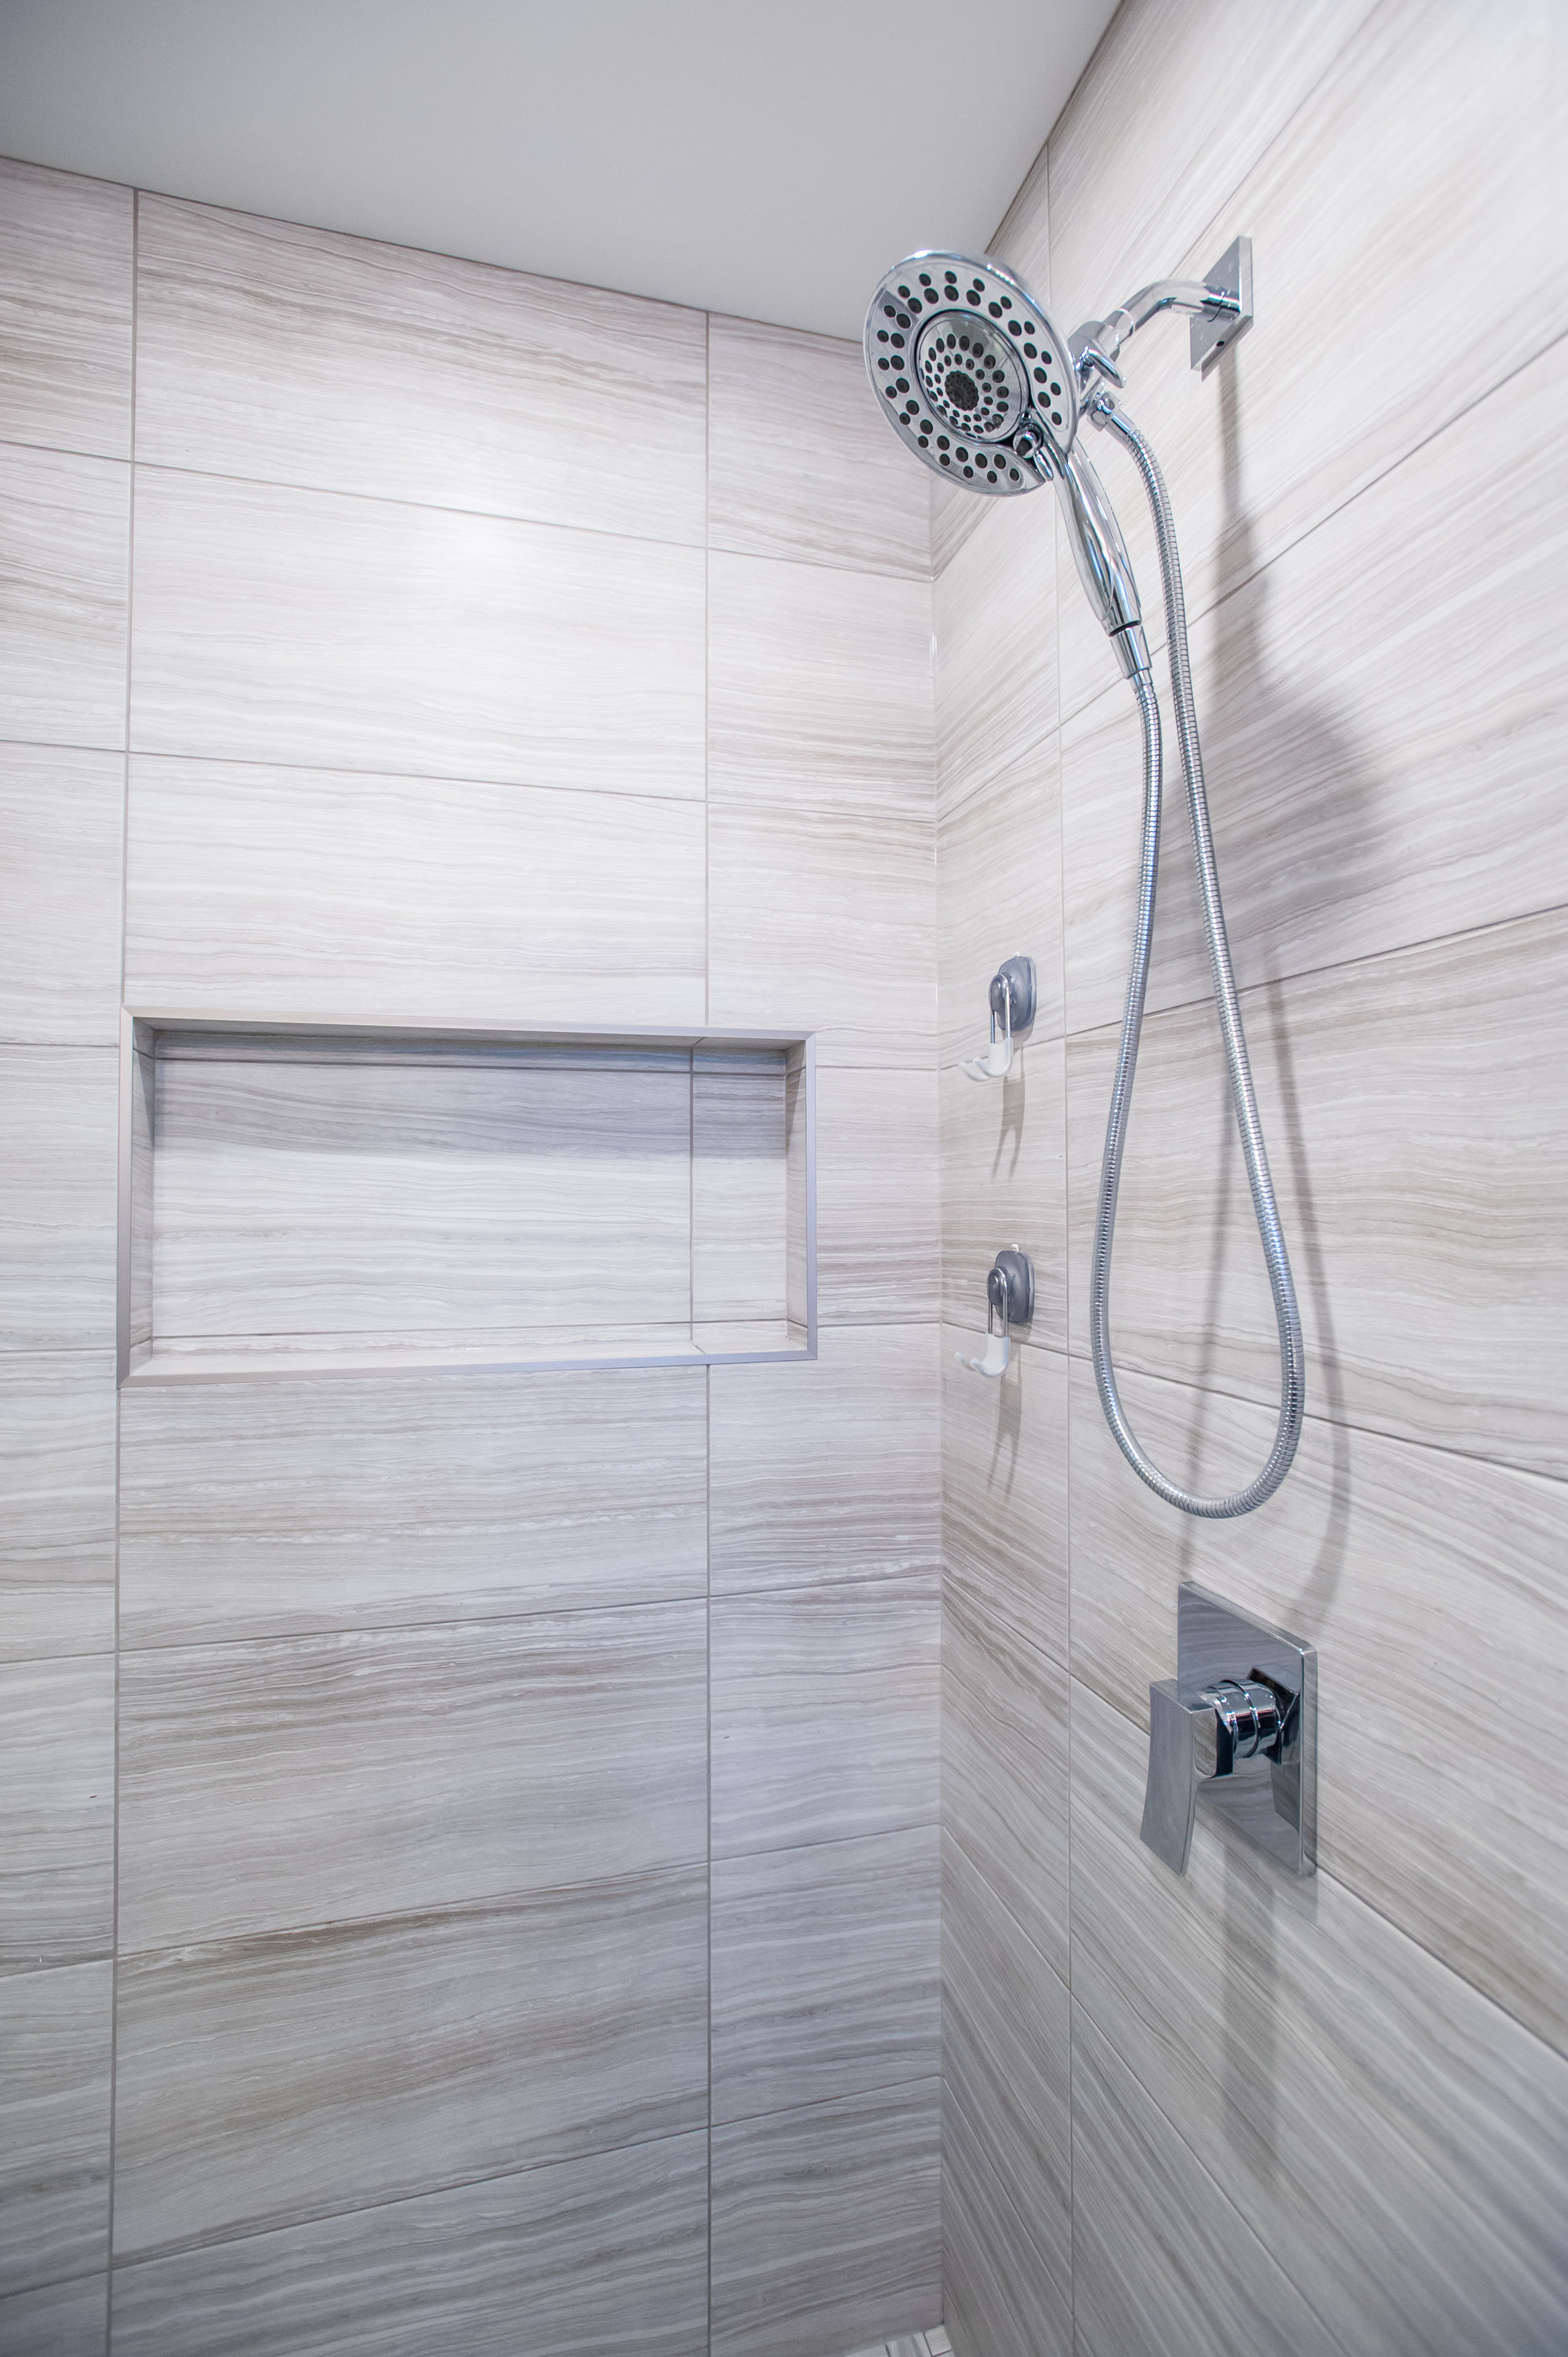 shower_mosaic_tile_glass